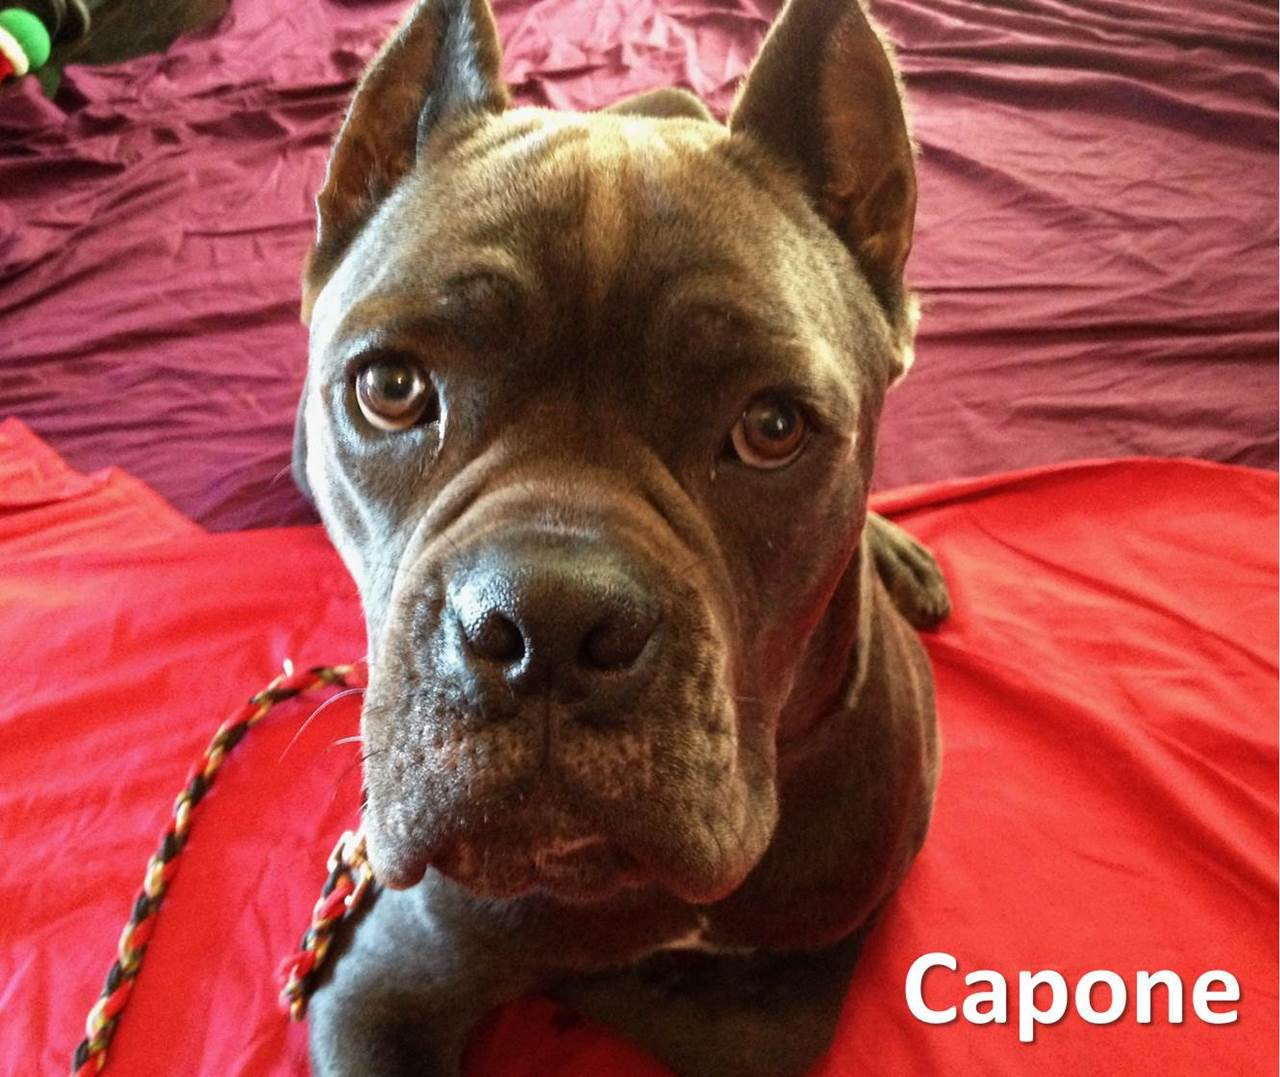 Steps For Dog On Dog Aggression Rehabilitation The Pooch Coach